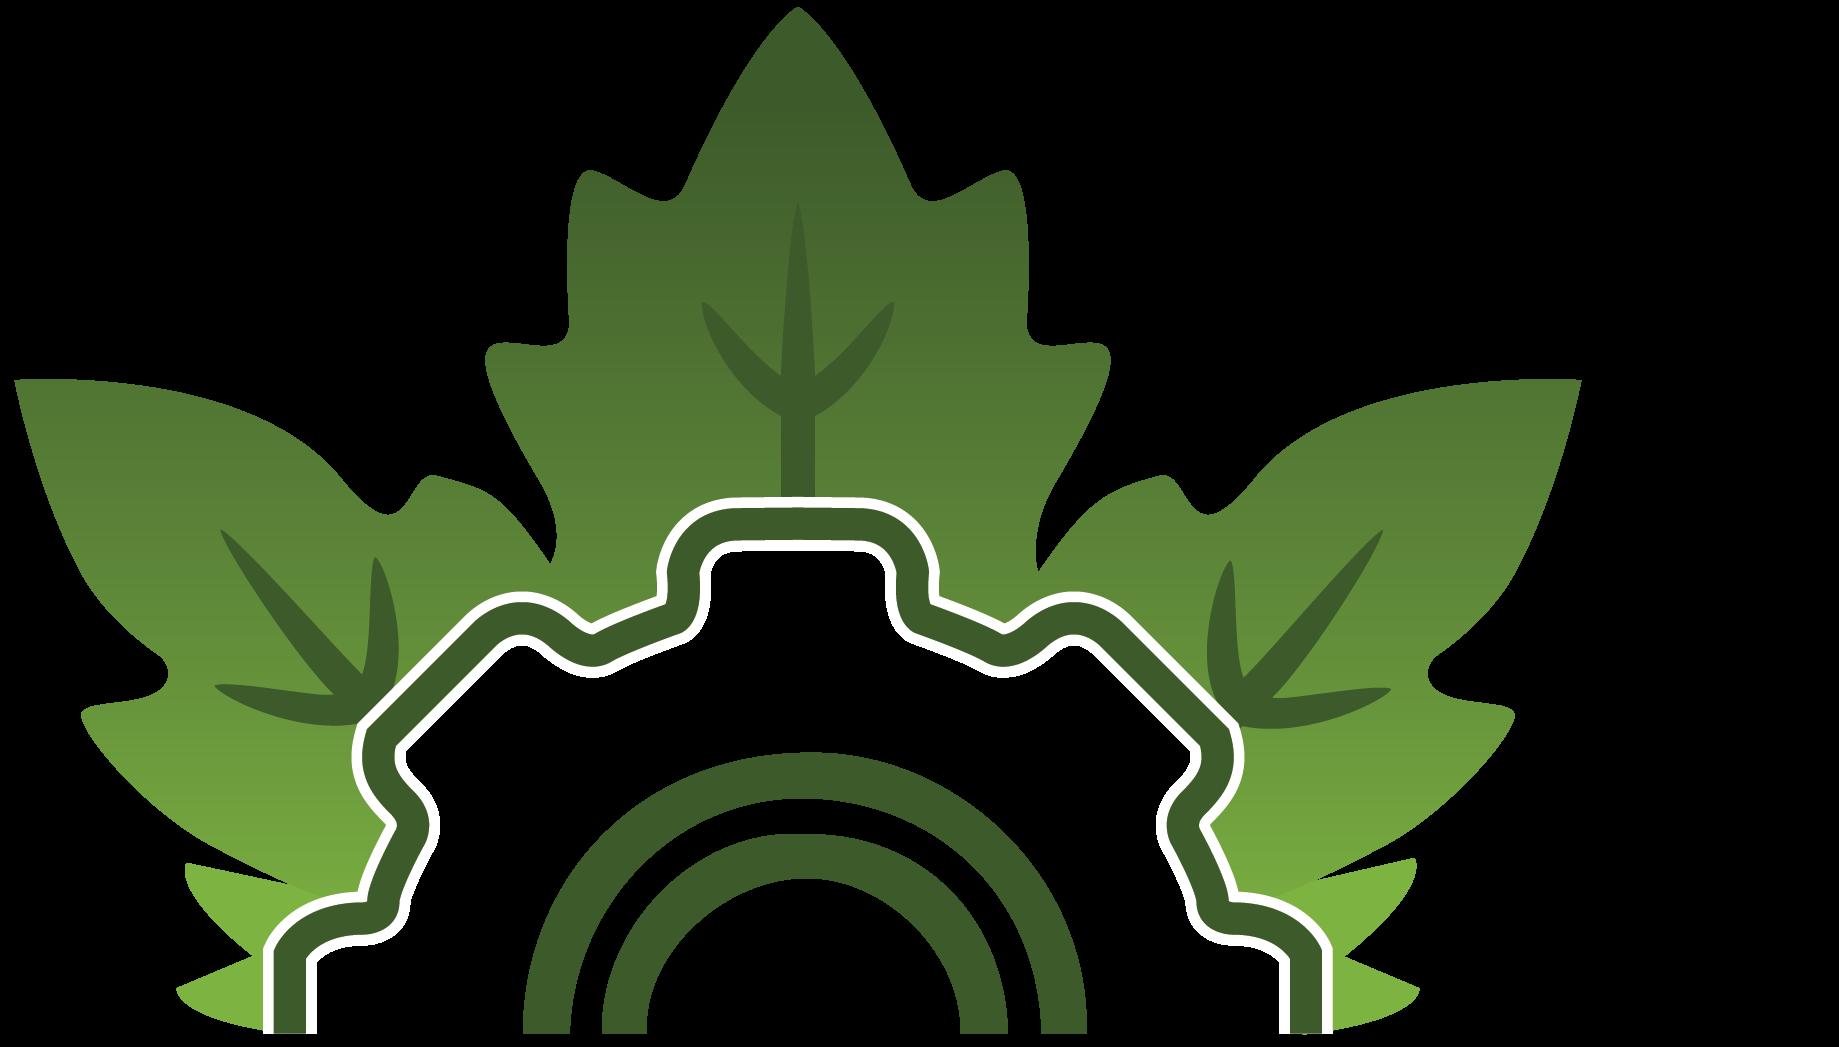 GroentechniekHabers